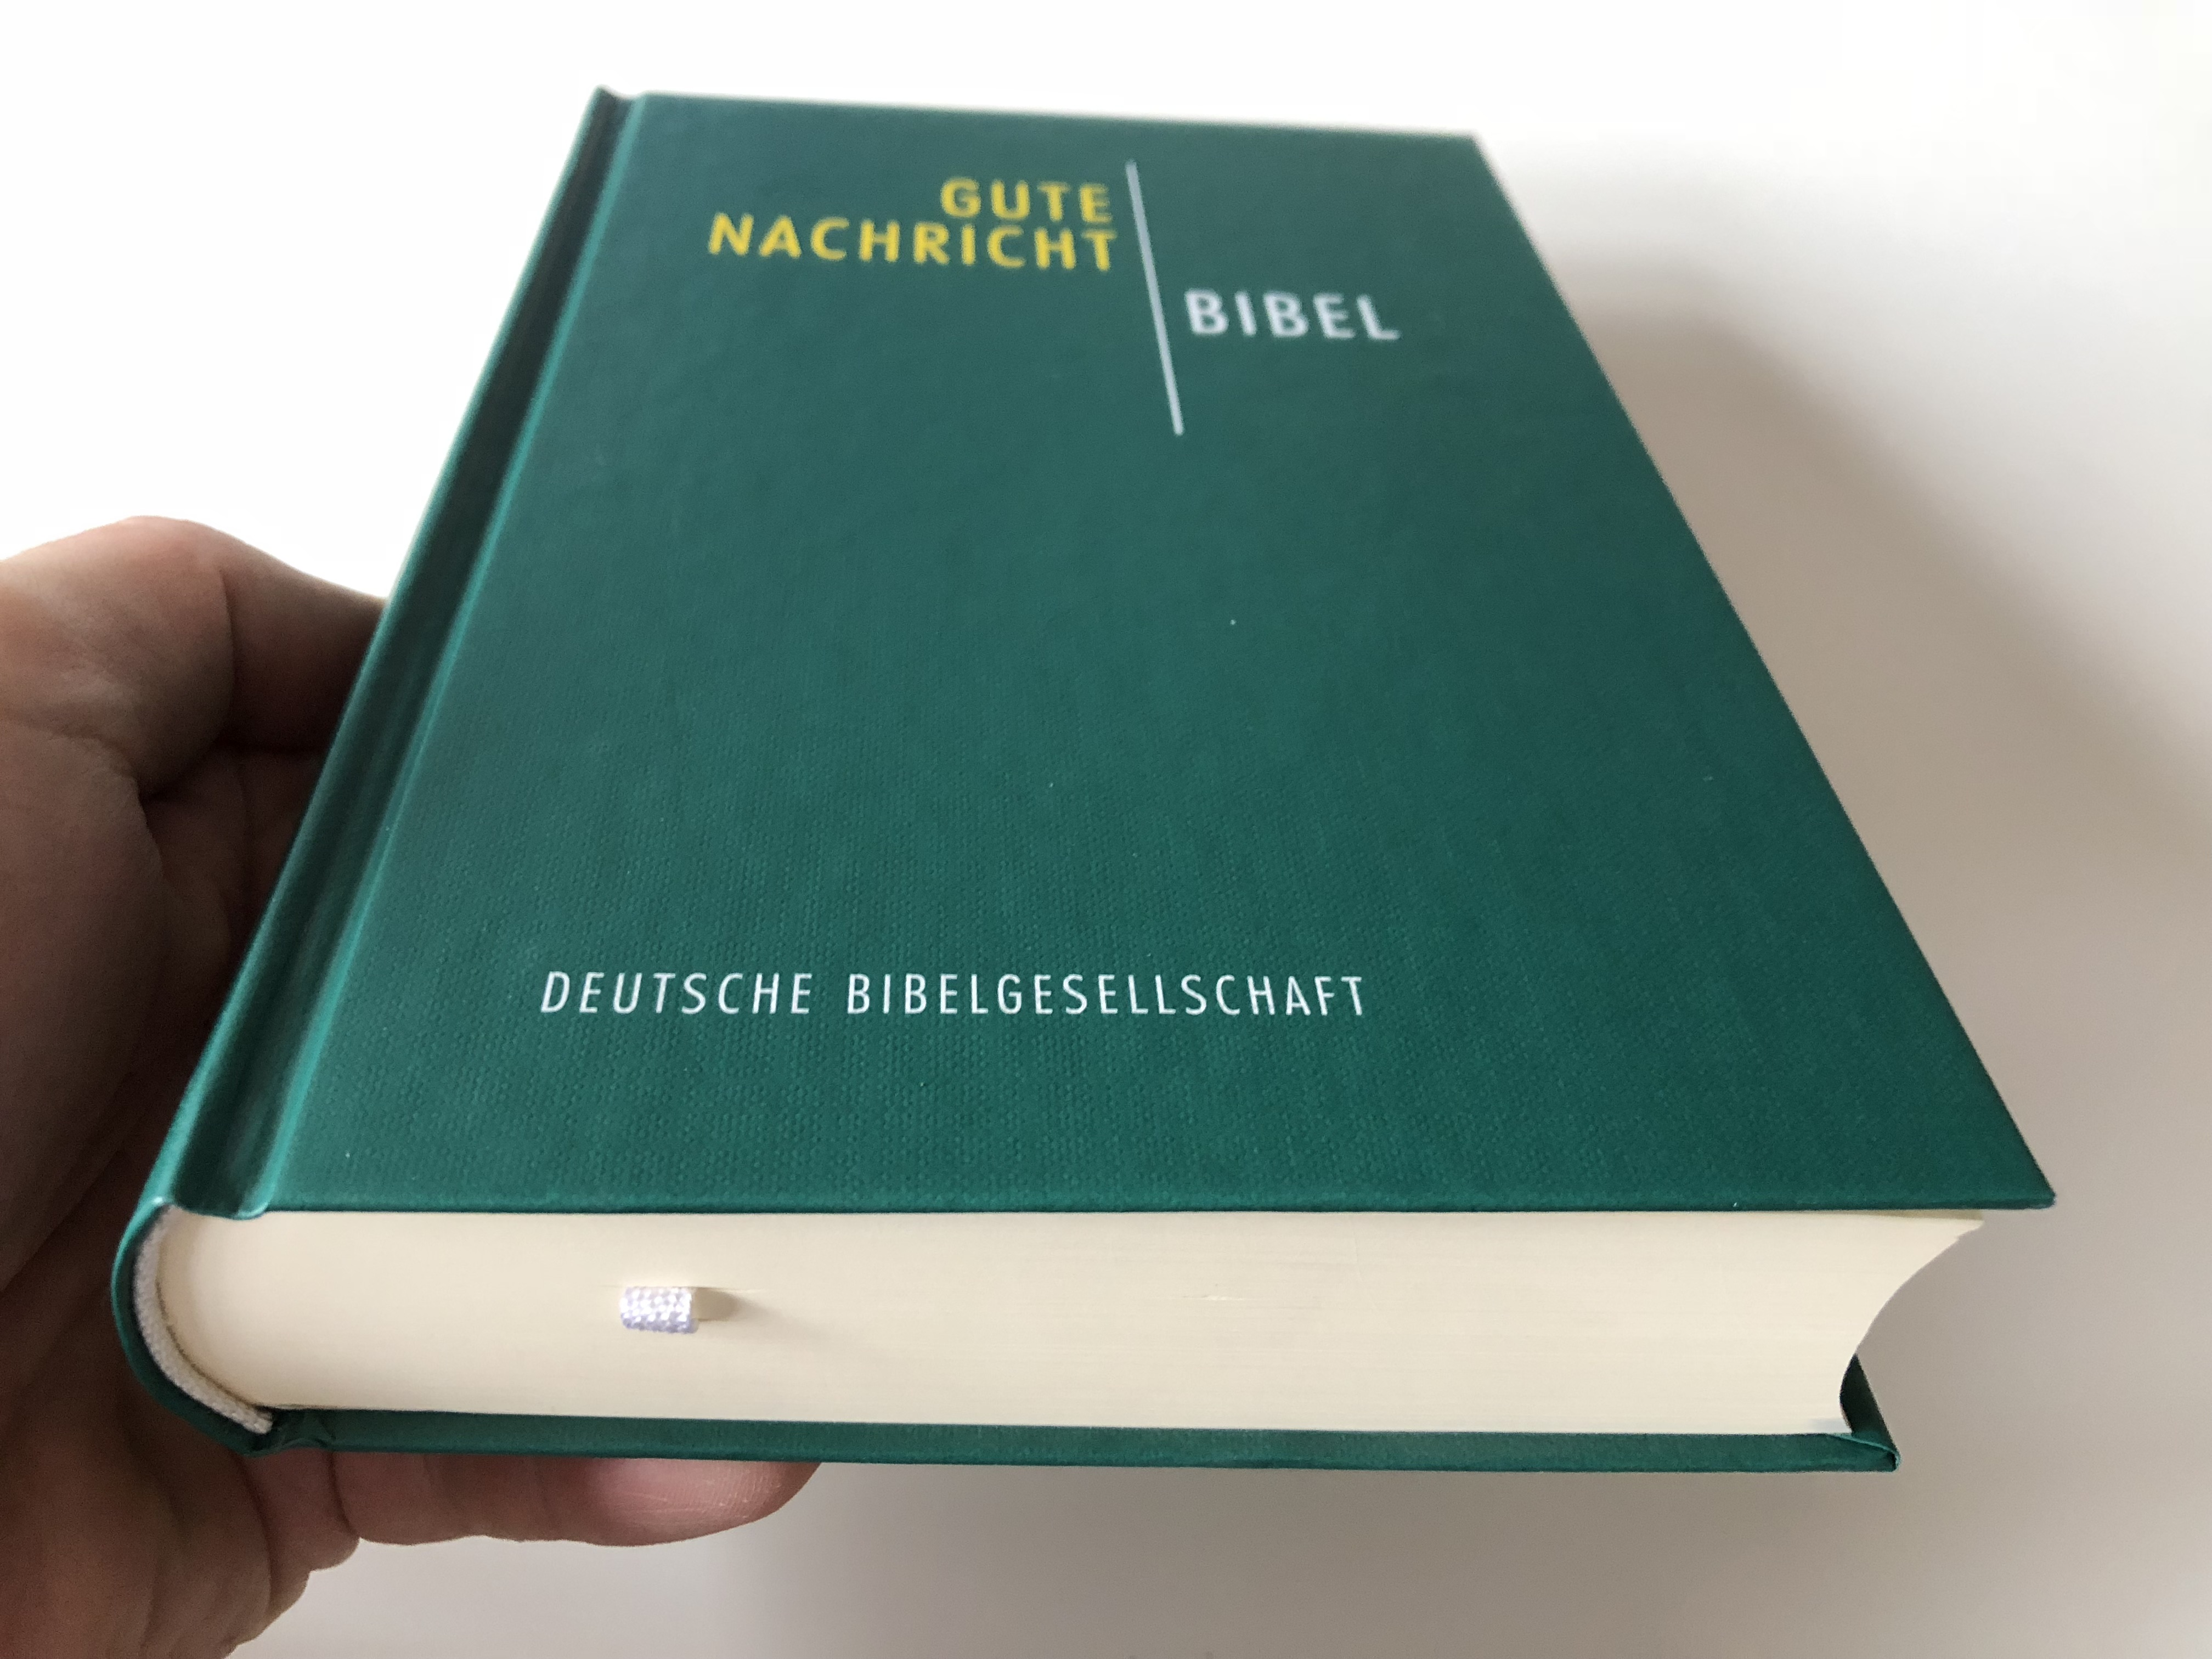 gute-nachricht-bibel-today-s-german-holy-bible-18-.jpg